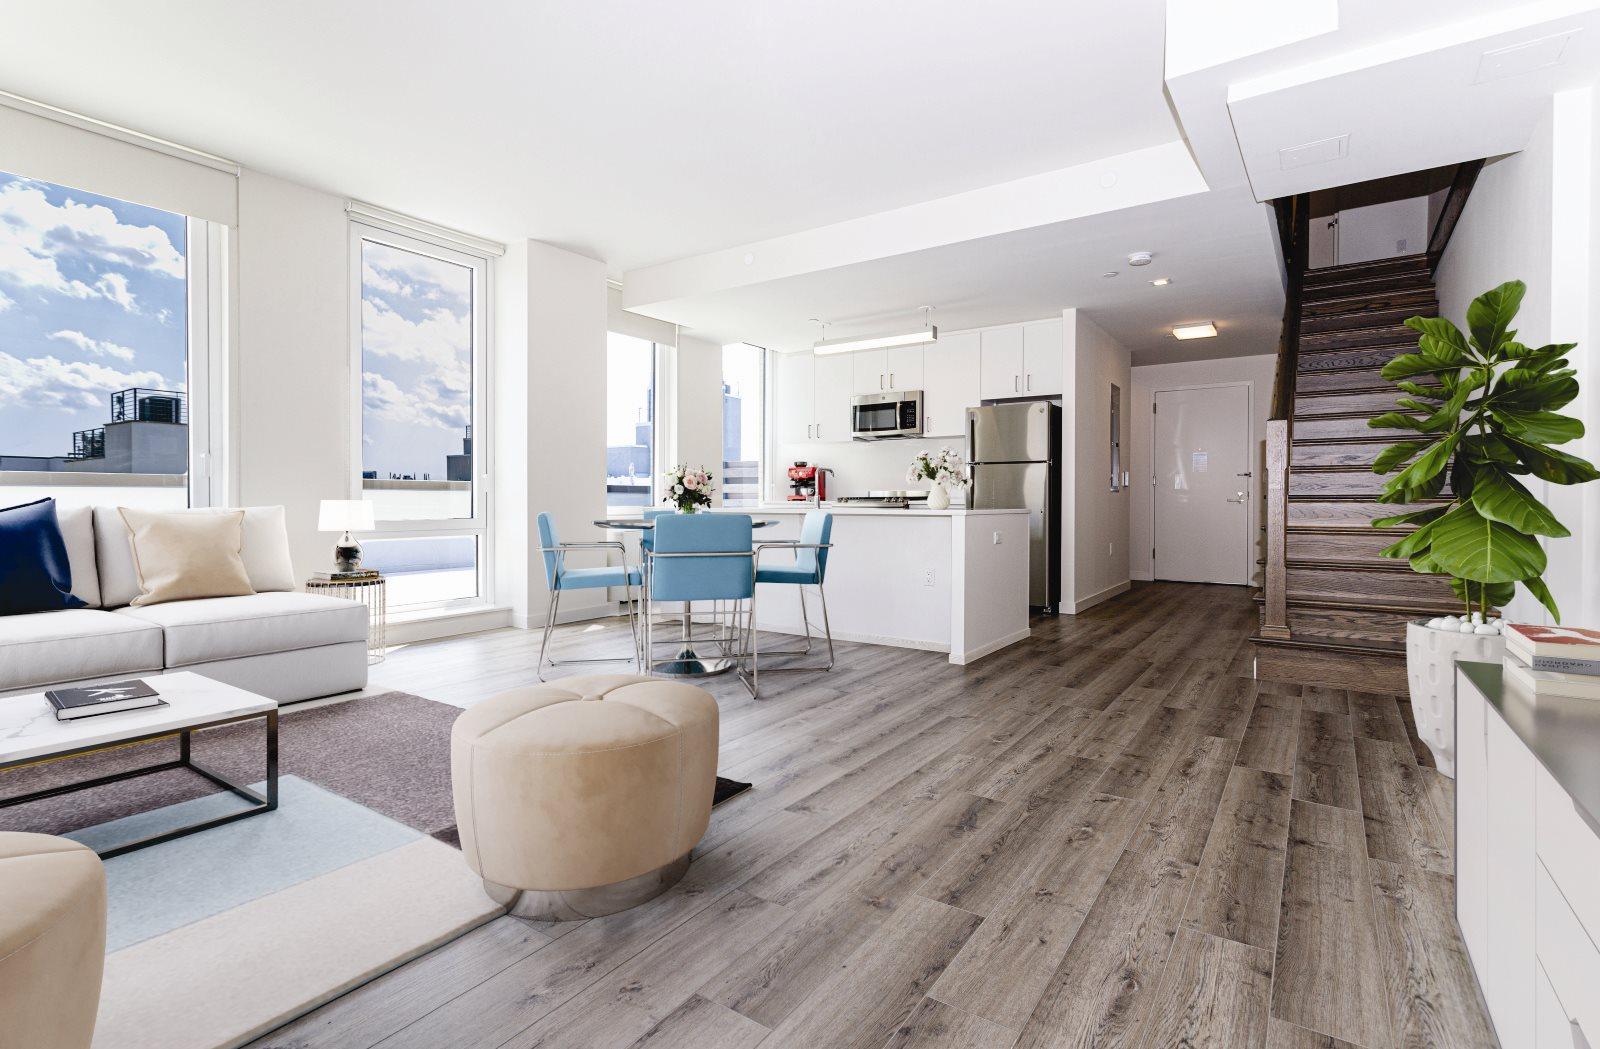 Heatherwood Luxury Rentals Luxury Apartment Rentals For Li And Nyc